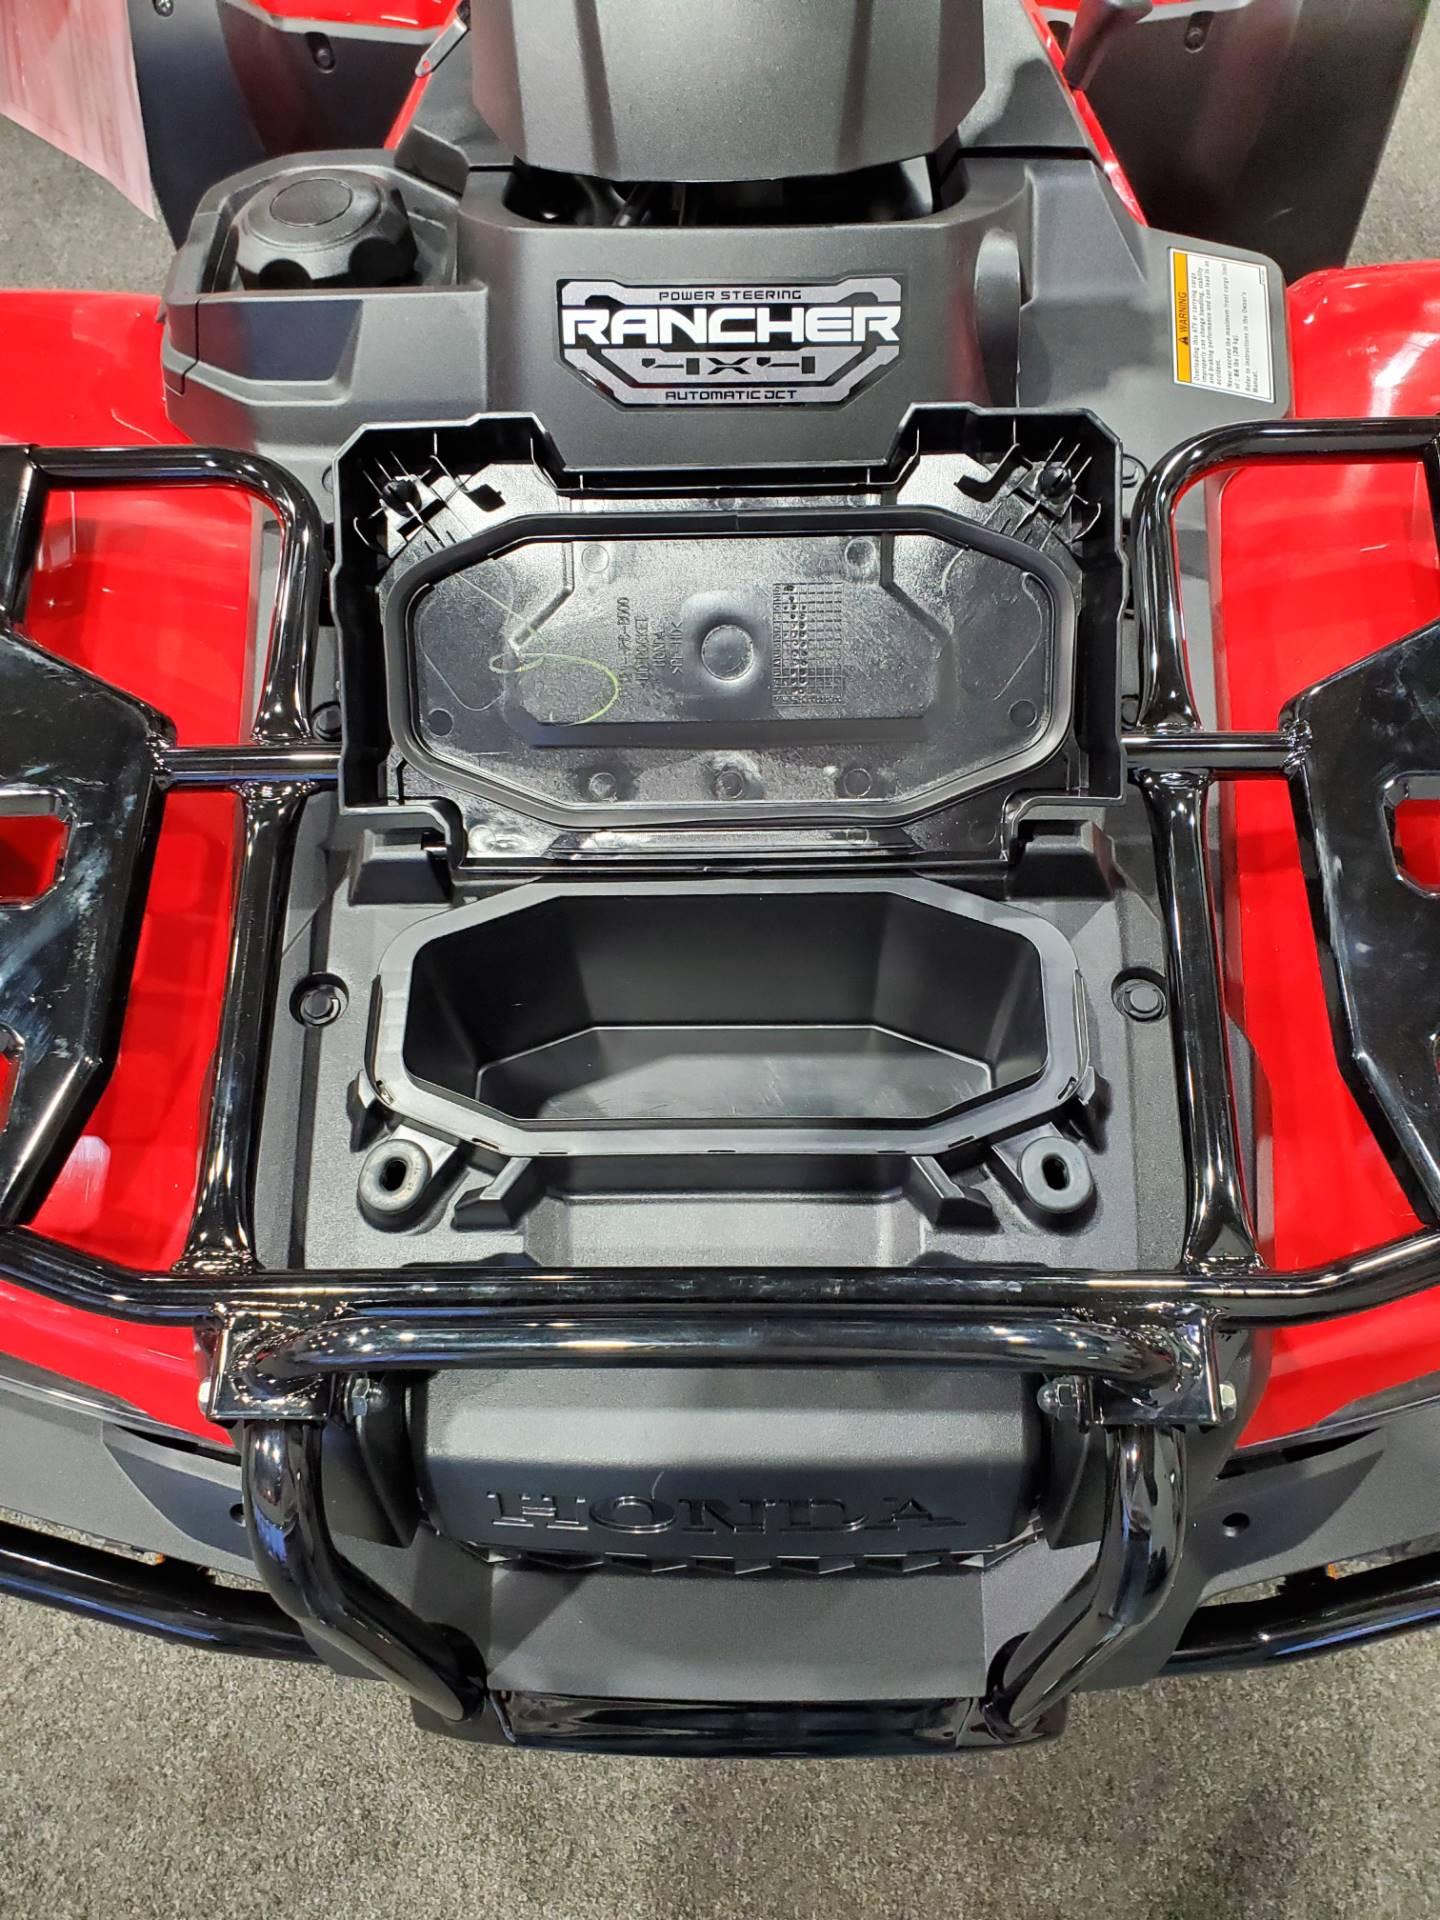 2021 Honda Fourtrax Rancher 4X4 Automatic Dct Eps In Moon Township,  Pennsylvania inside Pa Rut 2021